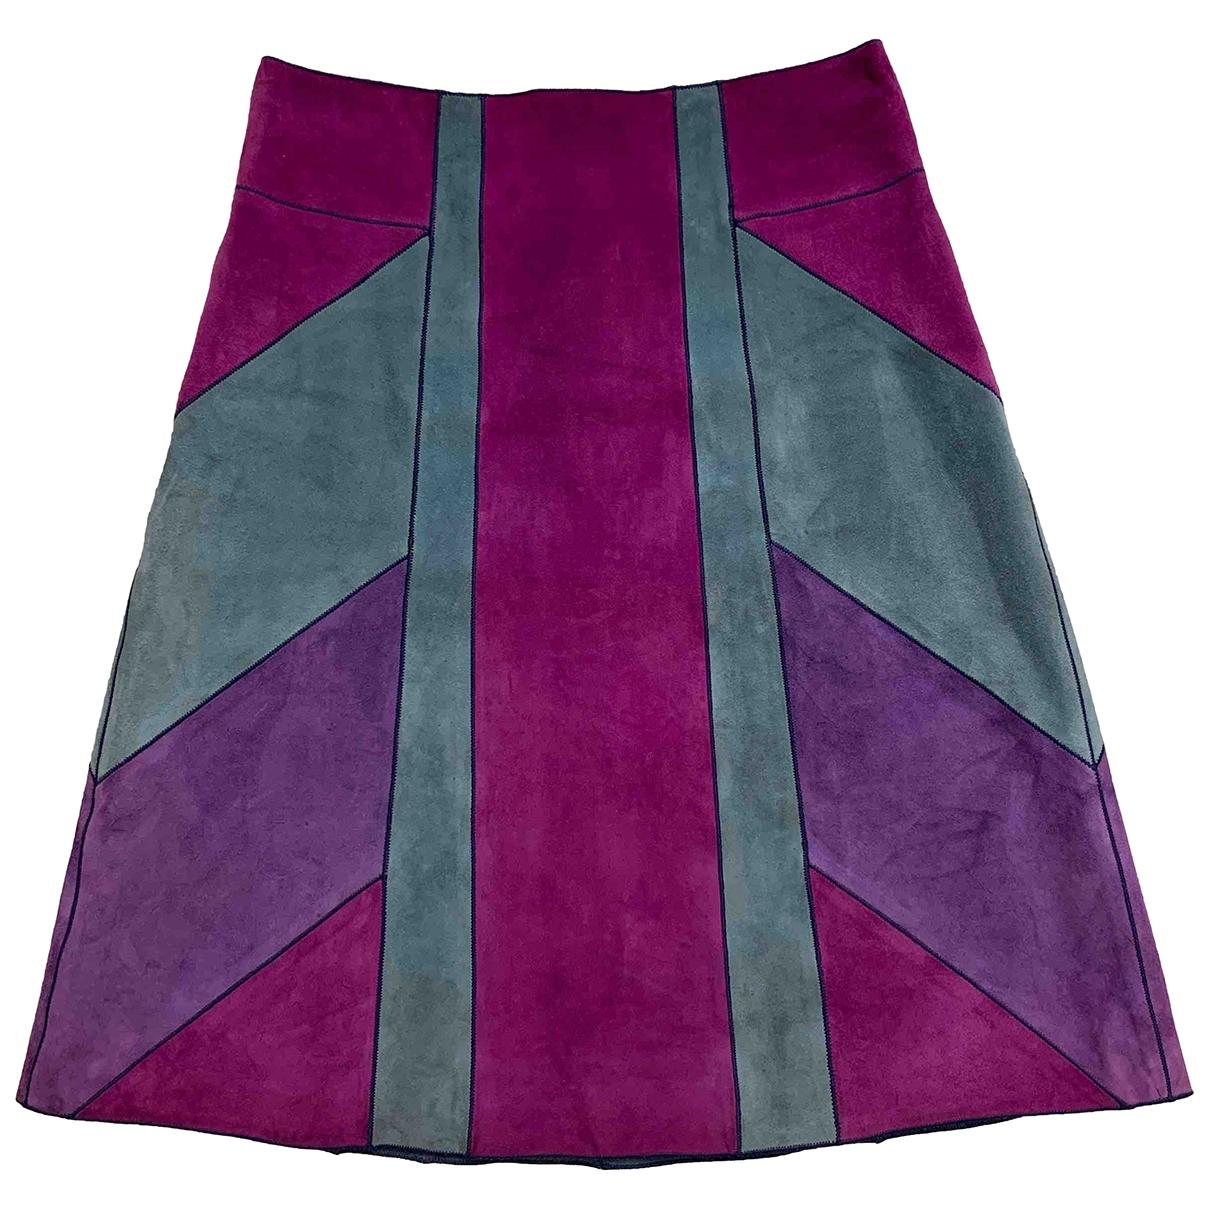 Louis Vuitton \N Multicolour Suede skirt for Women 36 FR